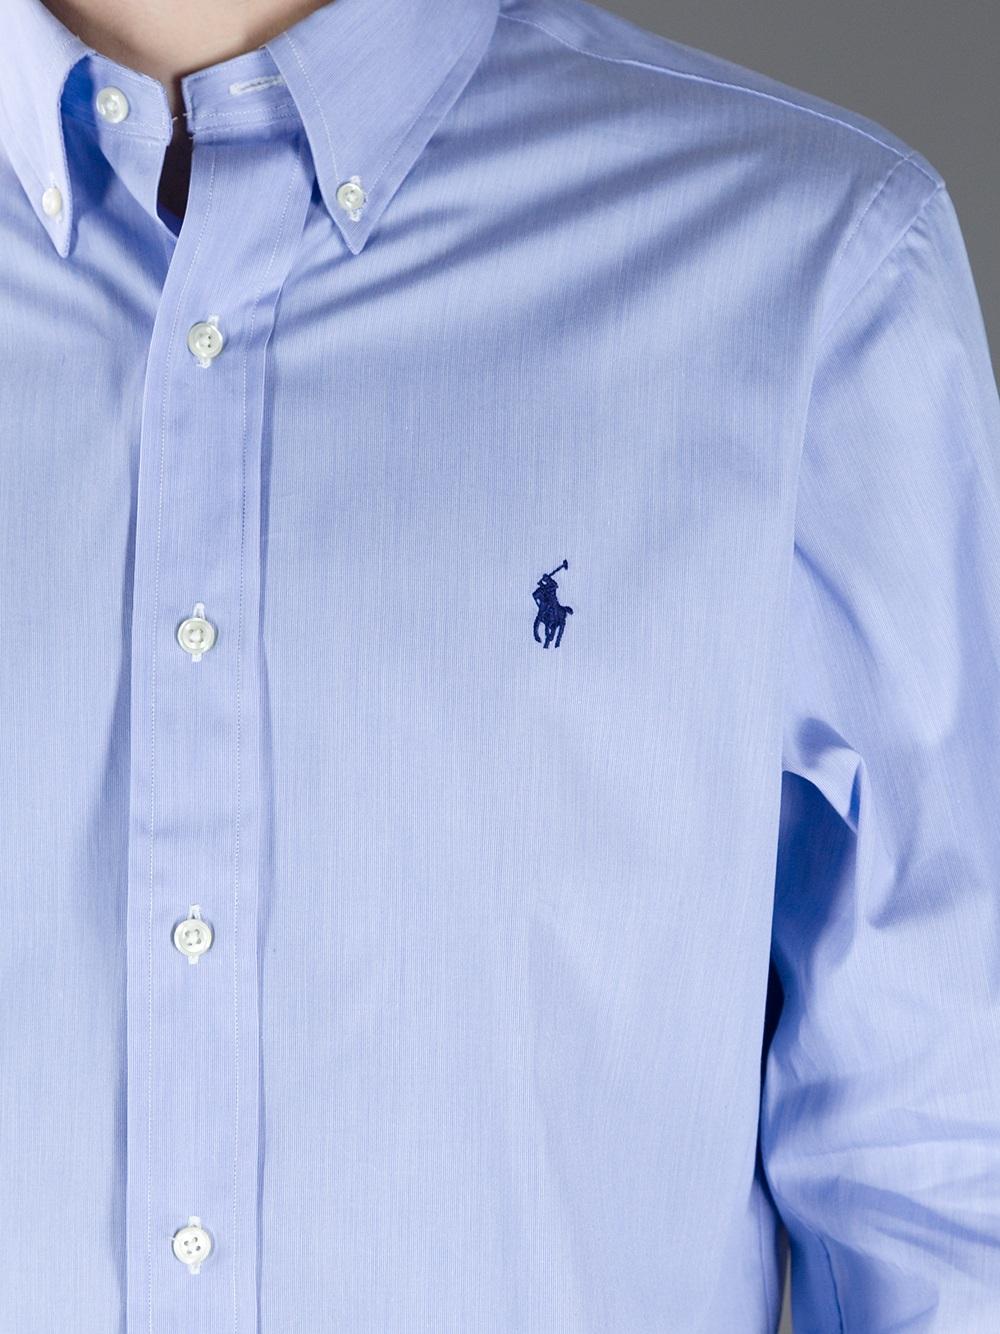 Lyst Polo Ralph Lauren Custom Fit Dress Shirt In Blue For Men